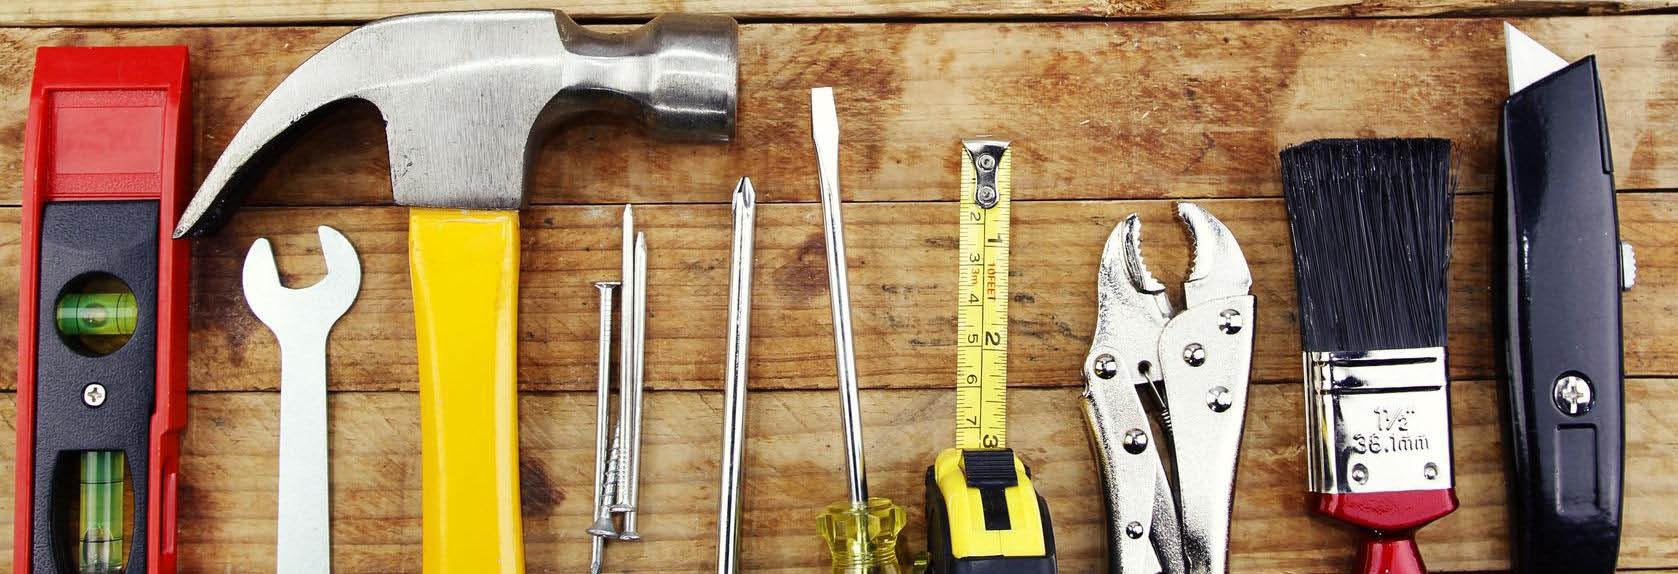 Handyman fixing cabinet. Gallagher Handyman On Demand fixes small jobs.